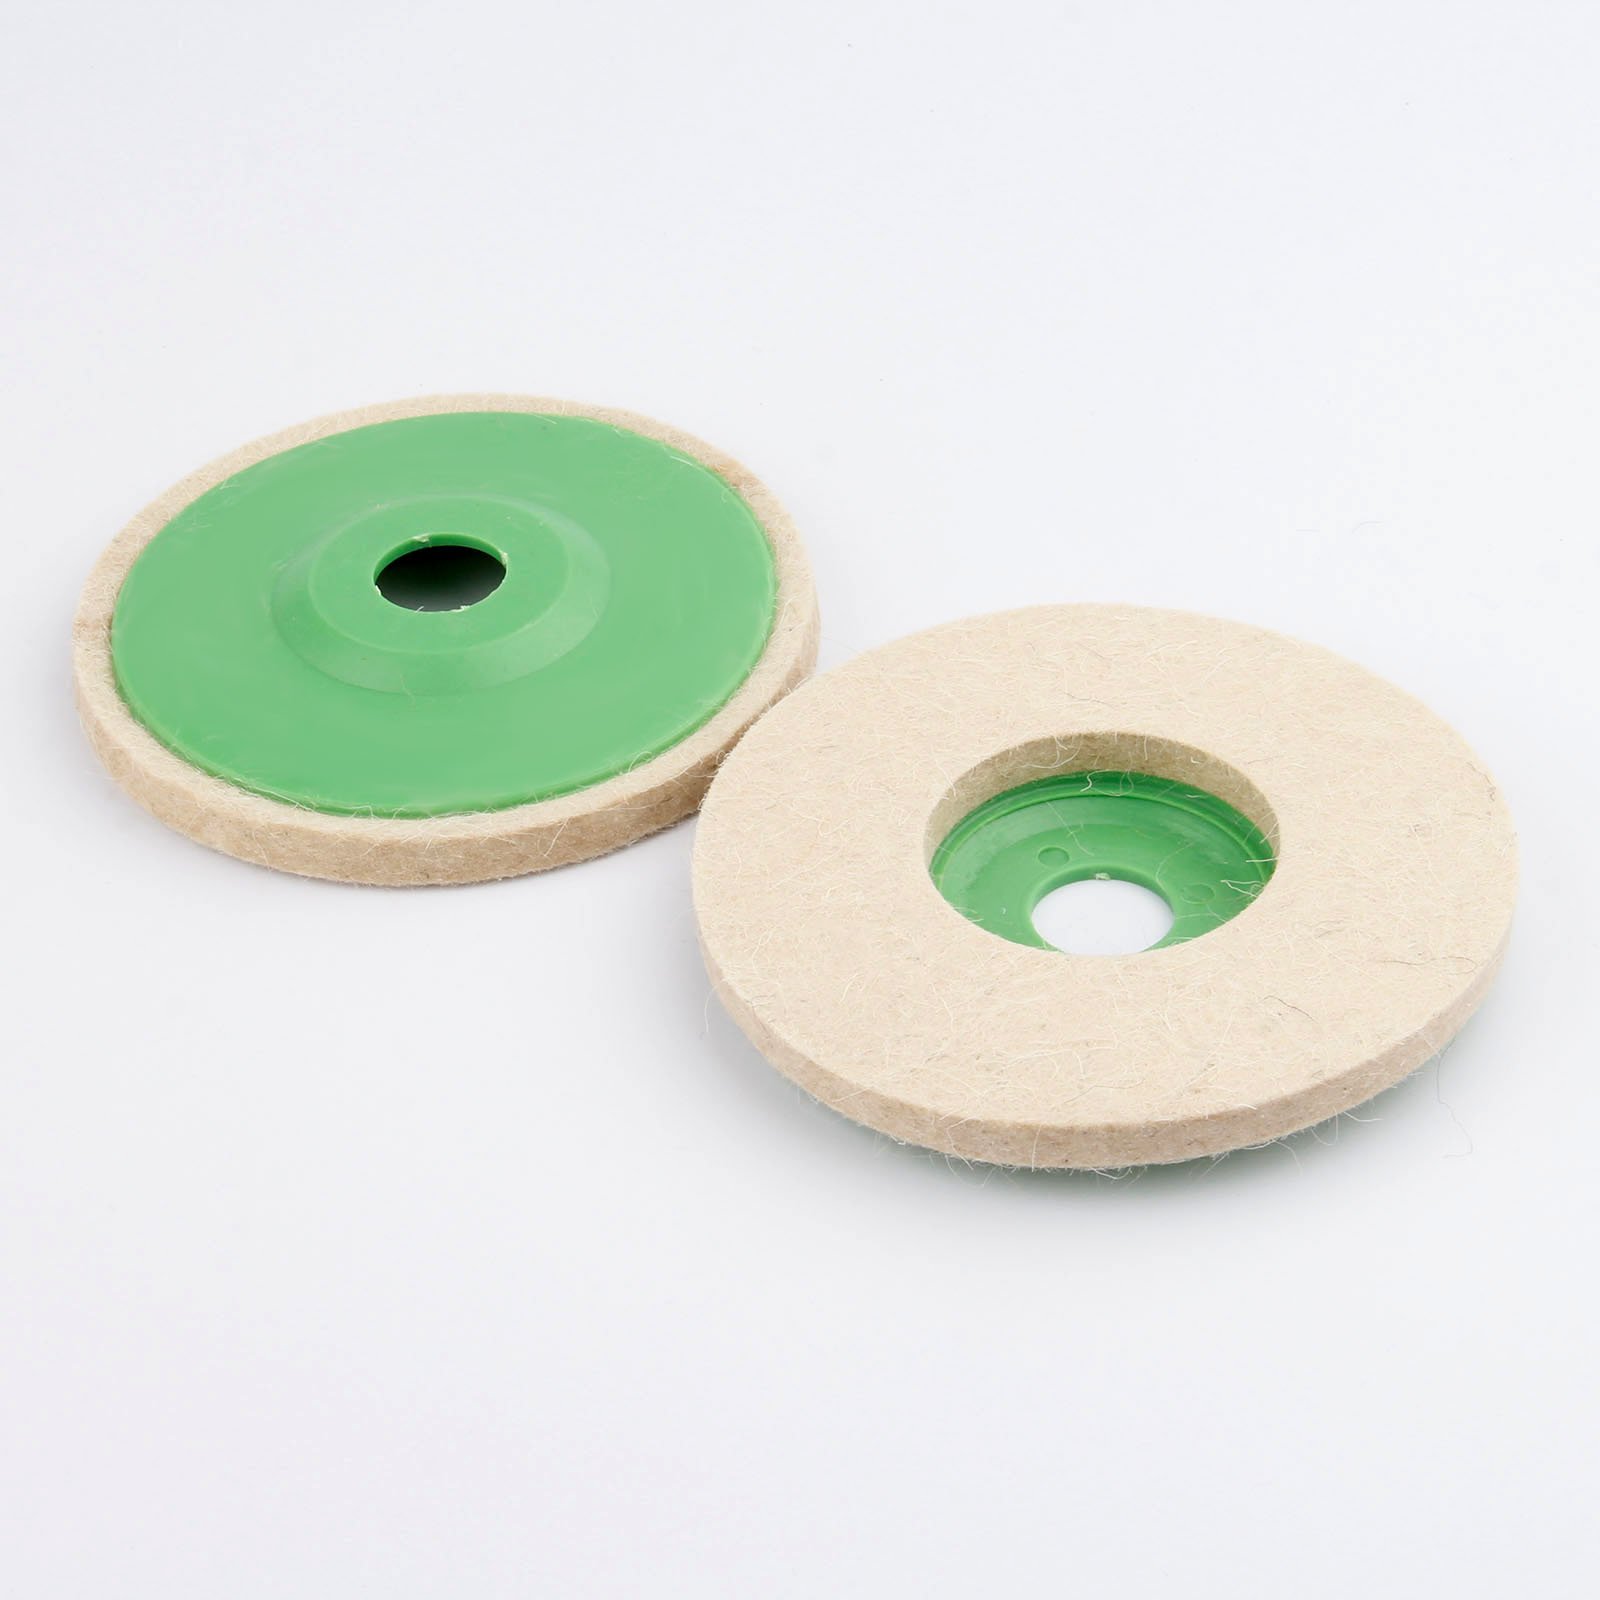 5in 125mm Wool Felt Grinding Wheel Pad Polishing Disc Buffer Polisher Tools